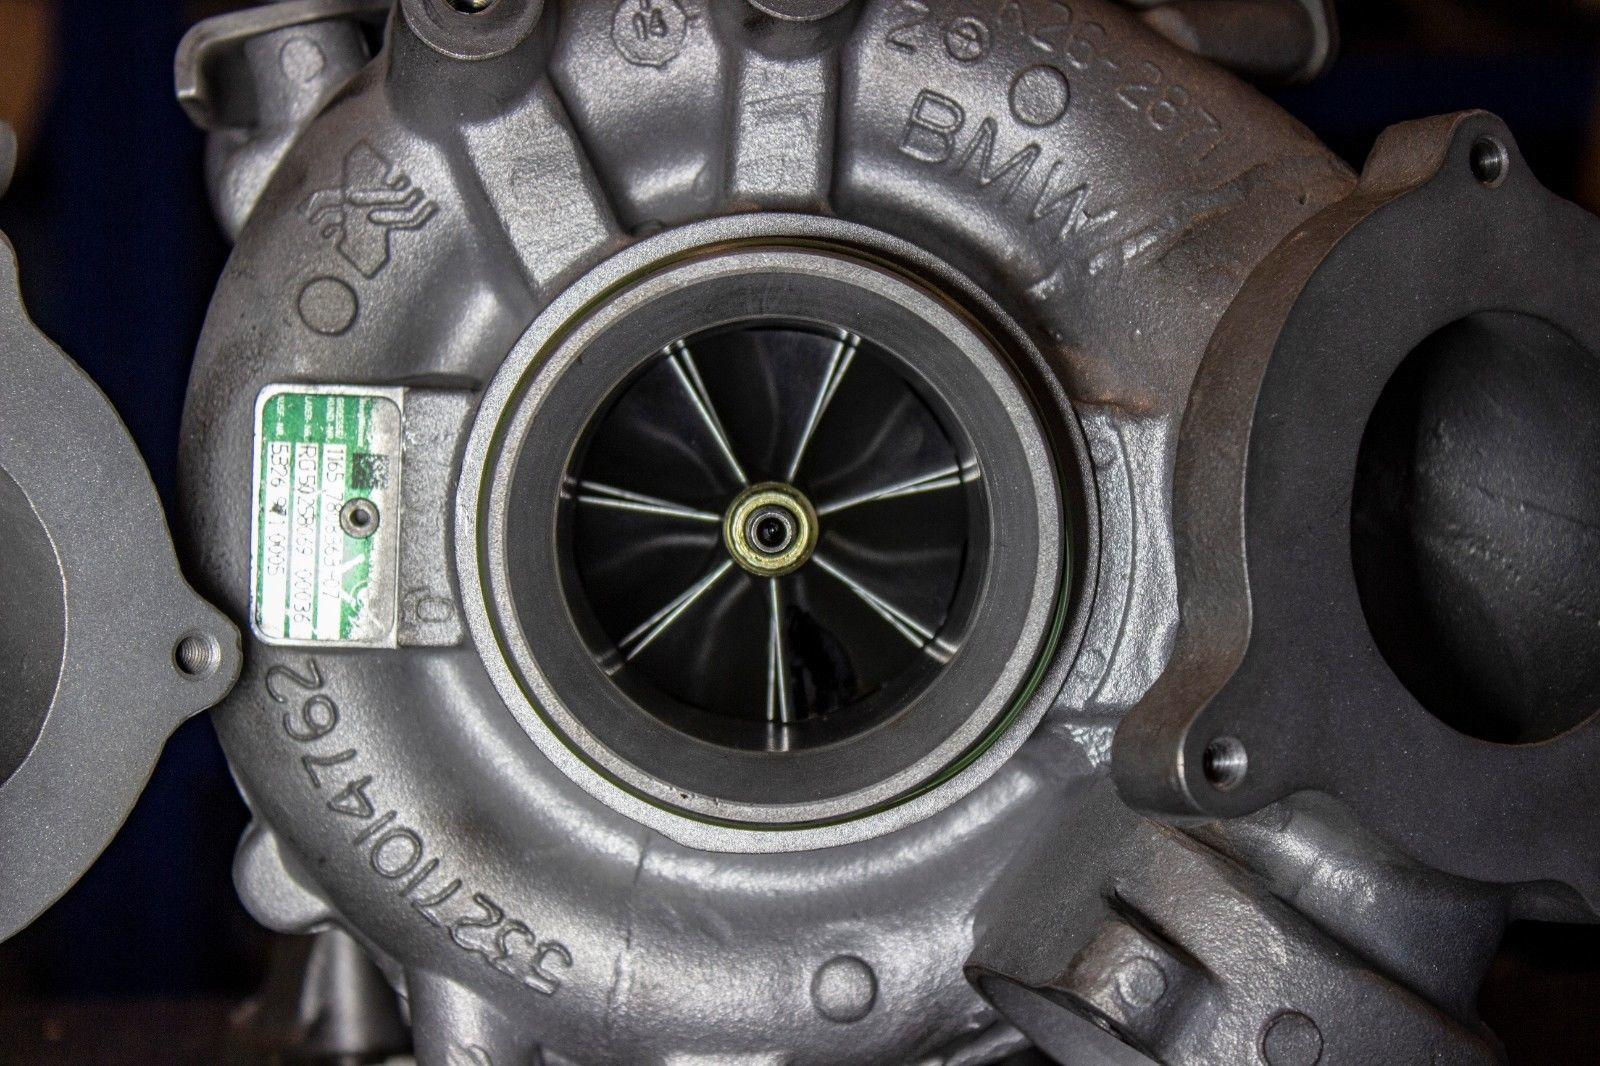 HYBRID-Turbocharger-for-BMW-535d-740d-xd-GT-X5-X6-30-53269700005-163264839498-8